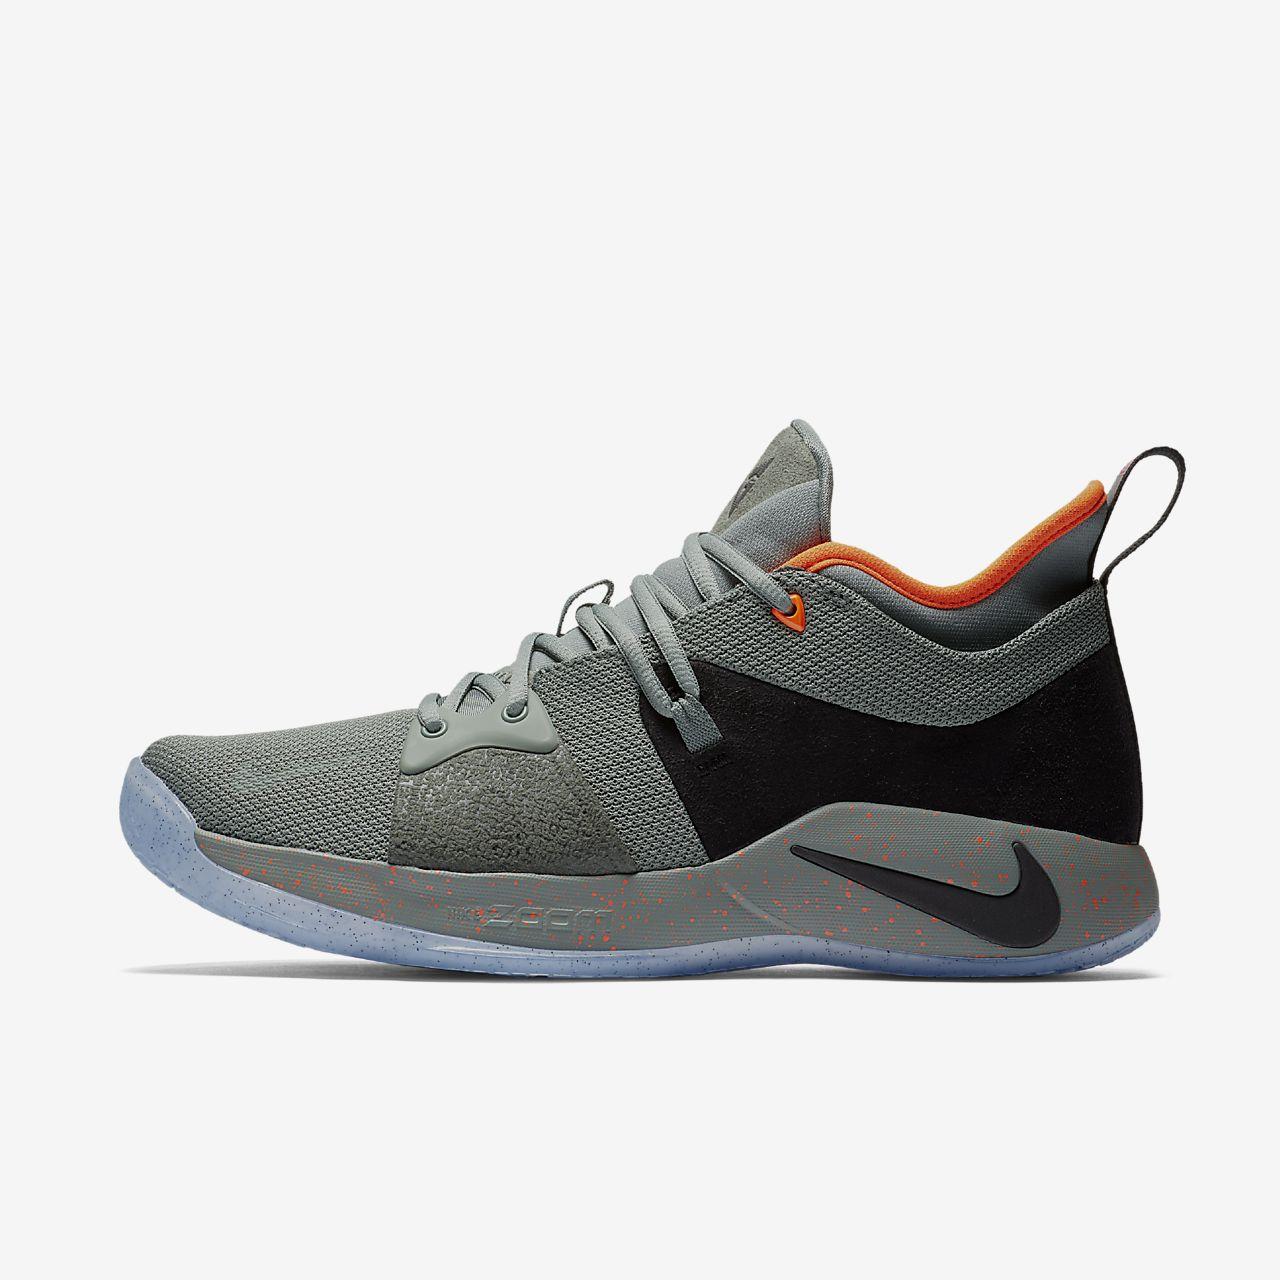 48818705a0a7 ... pg 2 palmdale mens basketball shoe